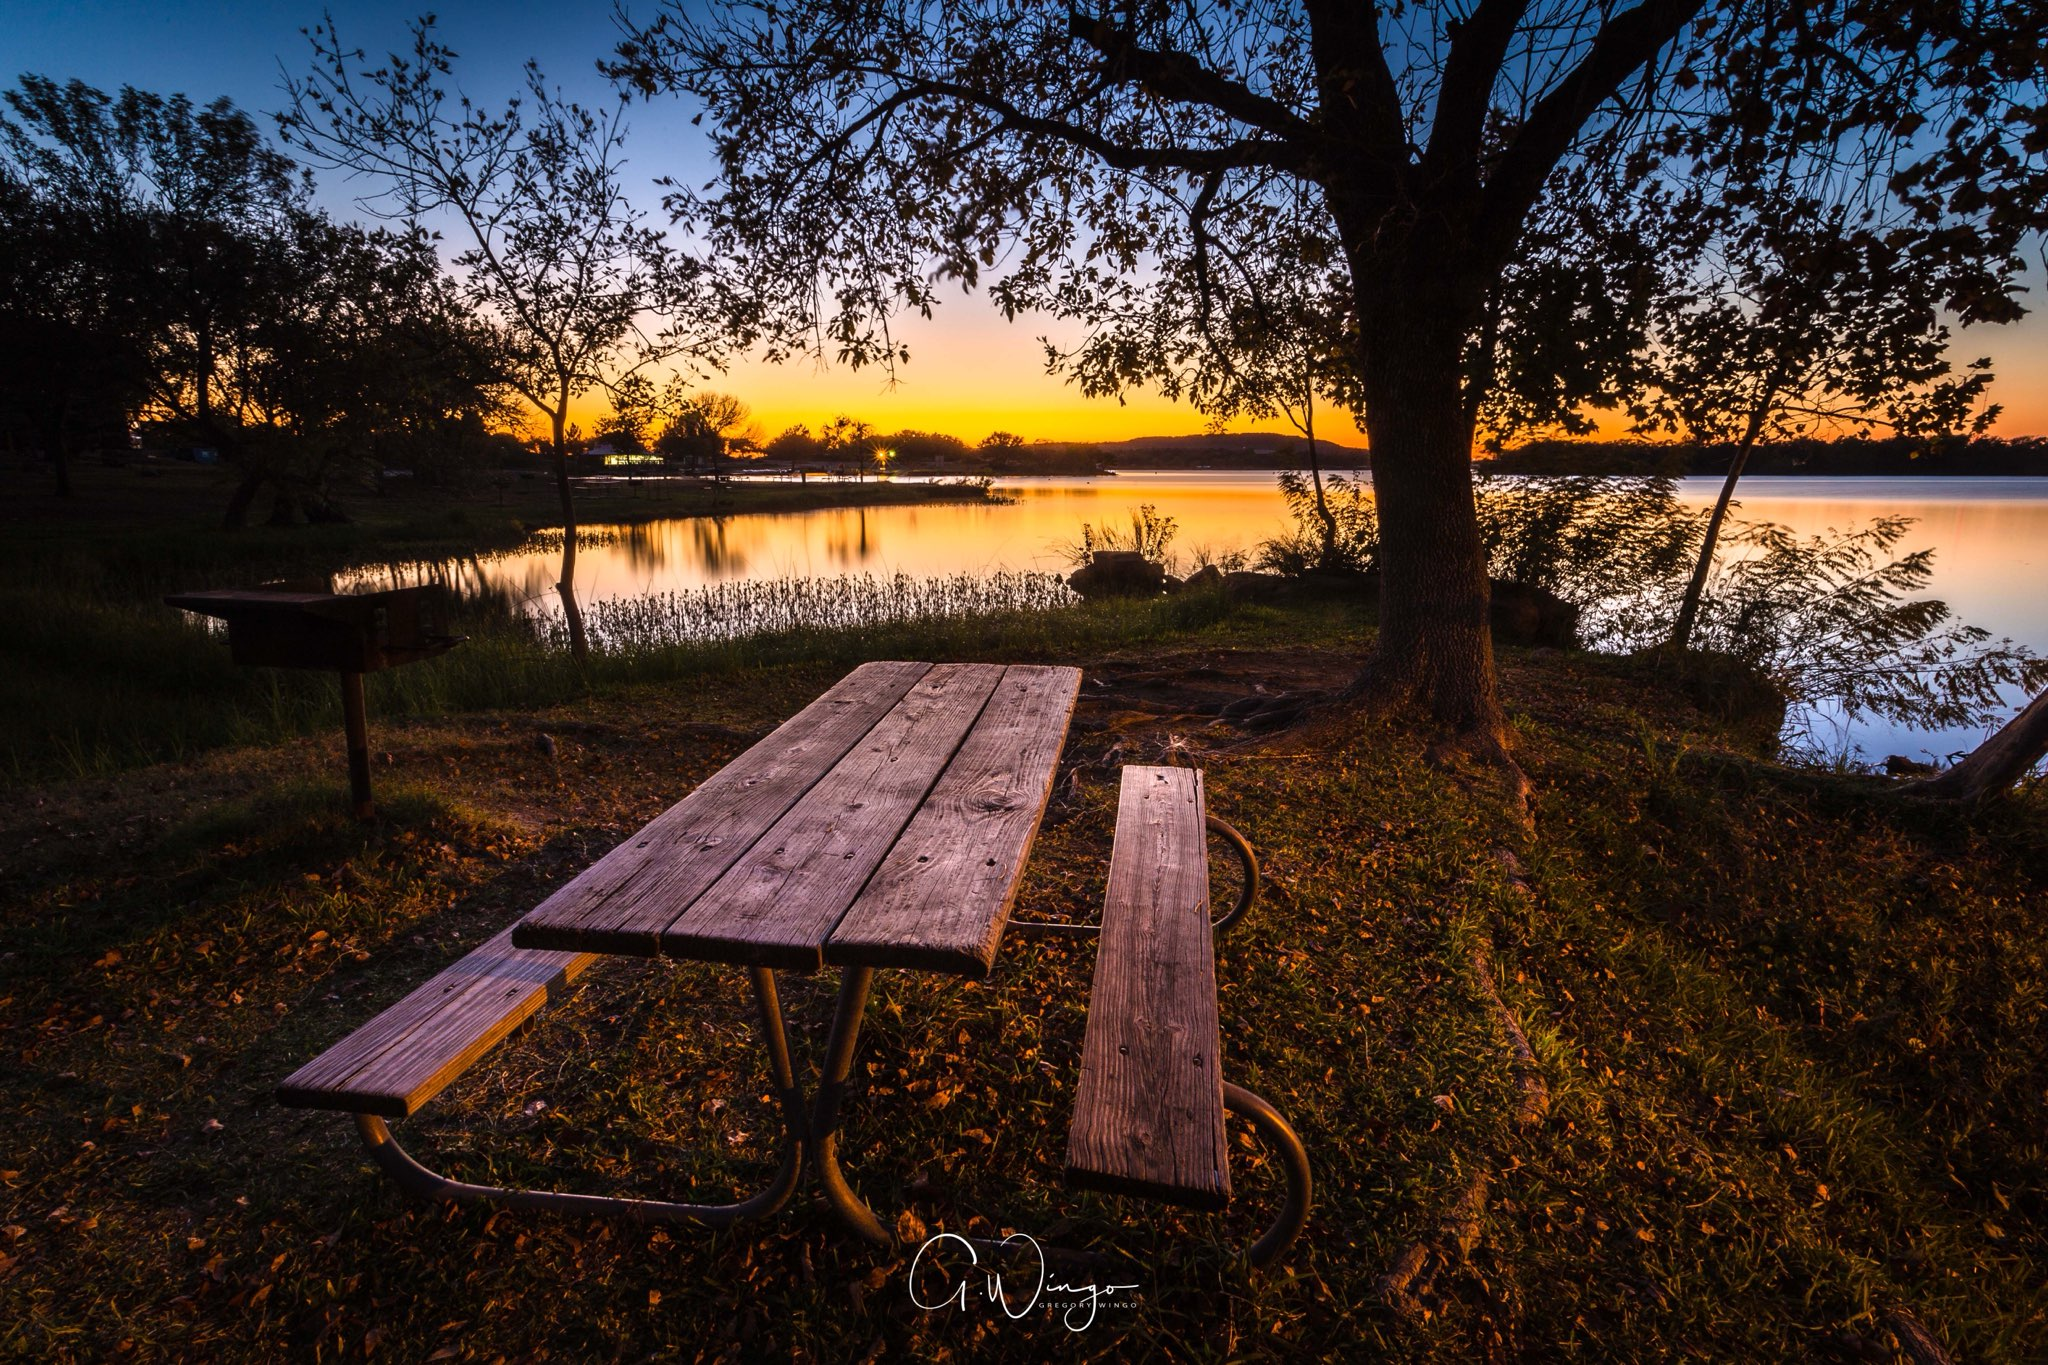 Sunset at Inks Lake in Burnet, TX.  December 1, 2017.